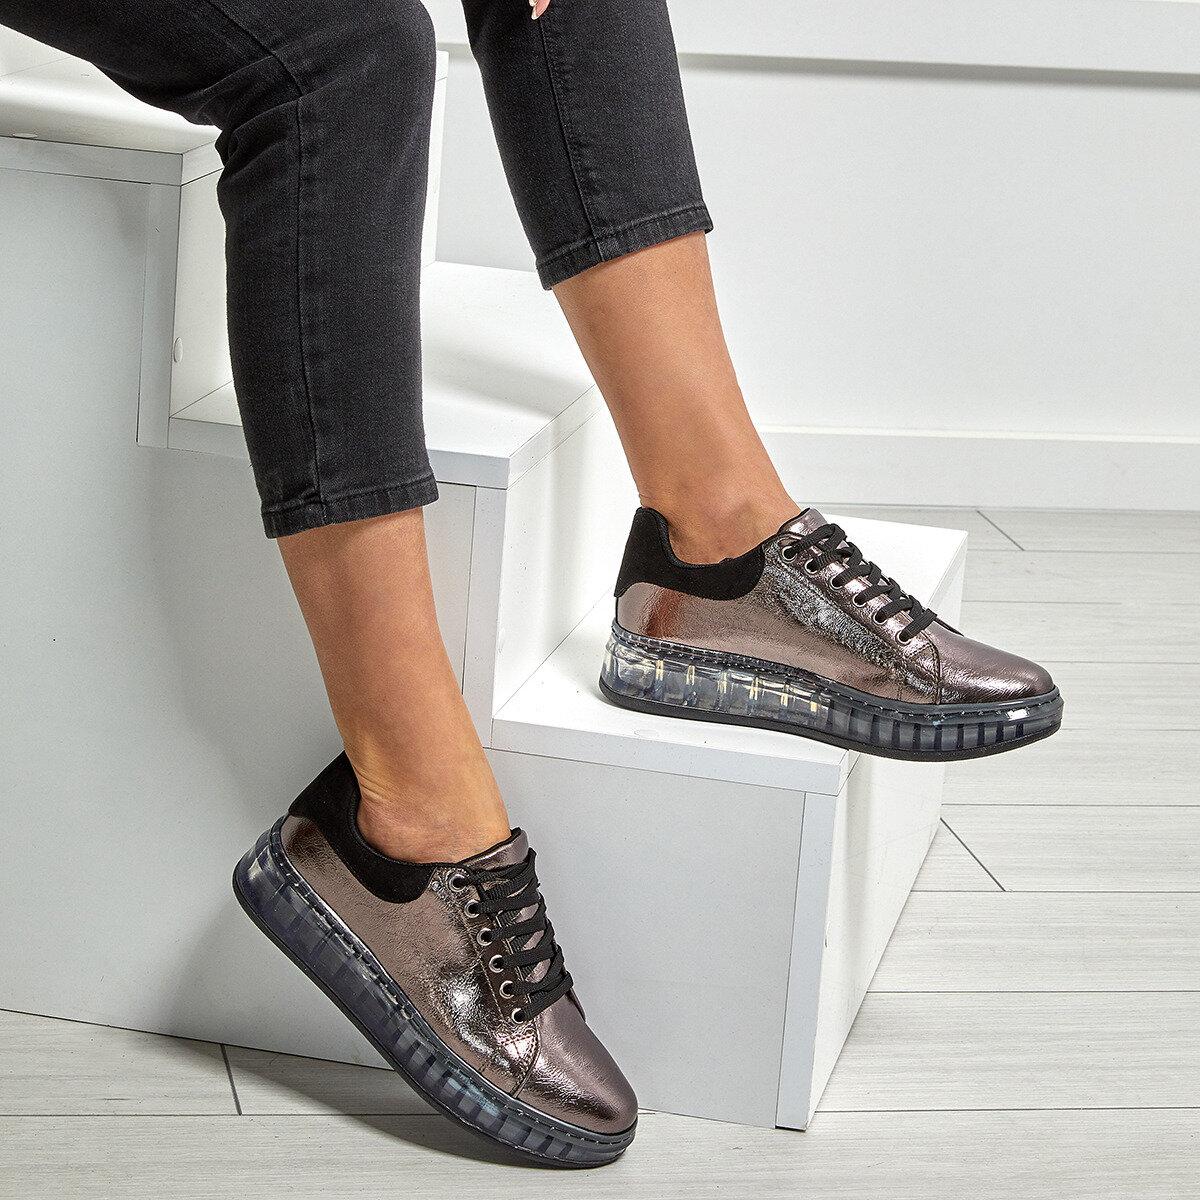 Zapatillas de deporte FLO para mujer, nuevas zapatillas de plataforma para mujer, zapatillas informales transpirables para mujer, moda BUTIGO SKYLAND gris SANDALIAS ARMONIAS PLATAFORMA